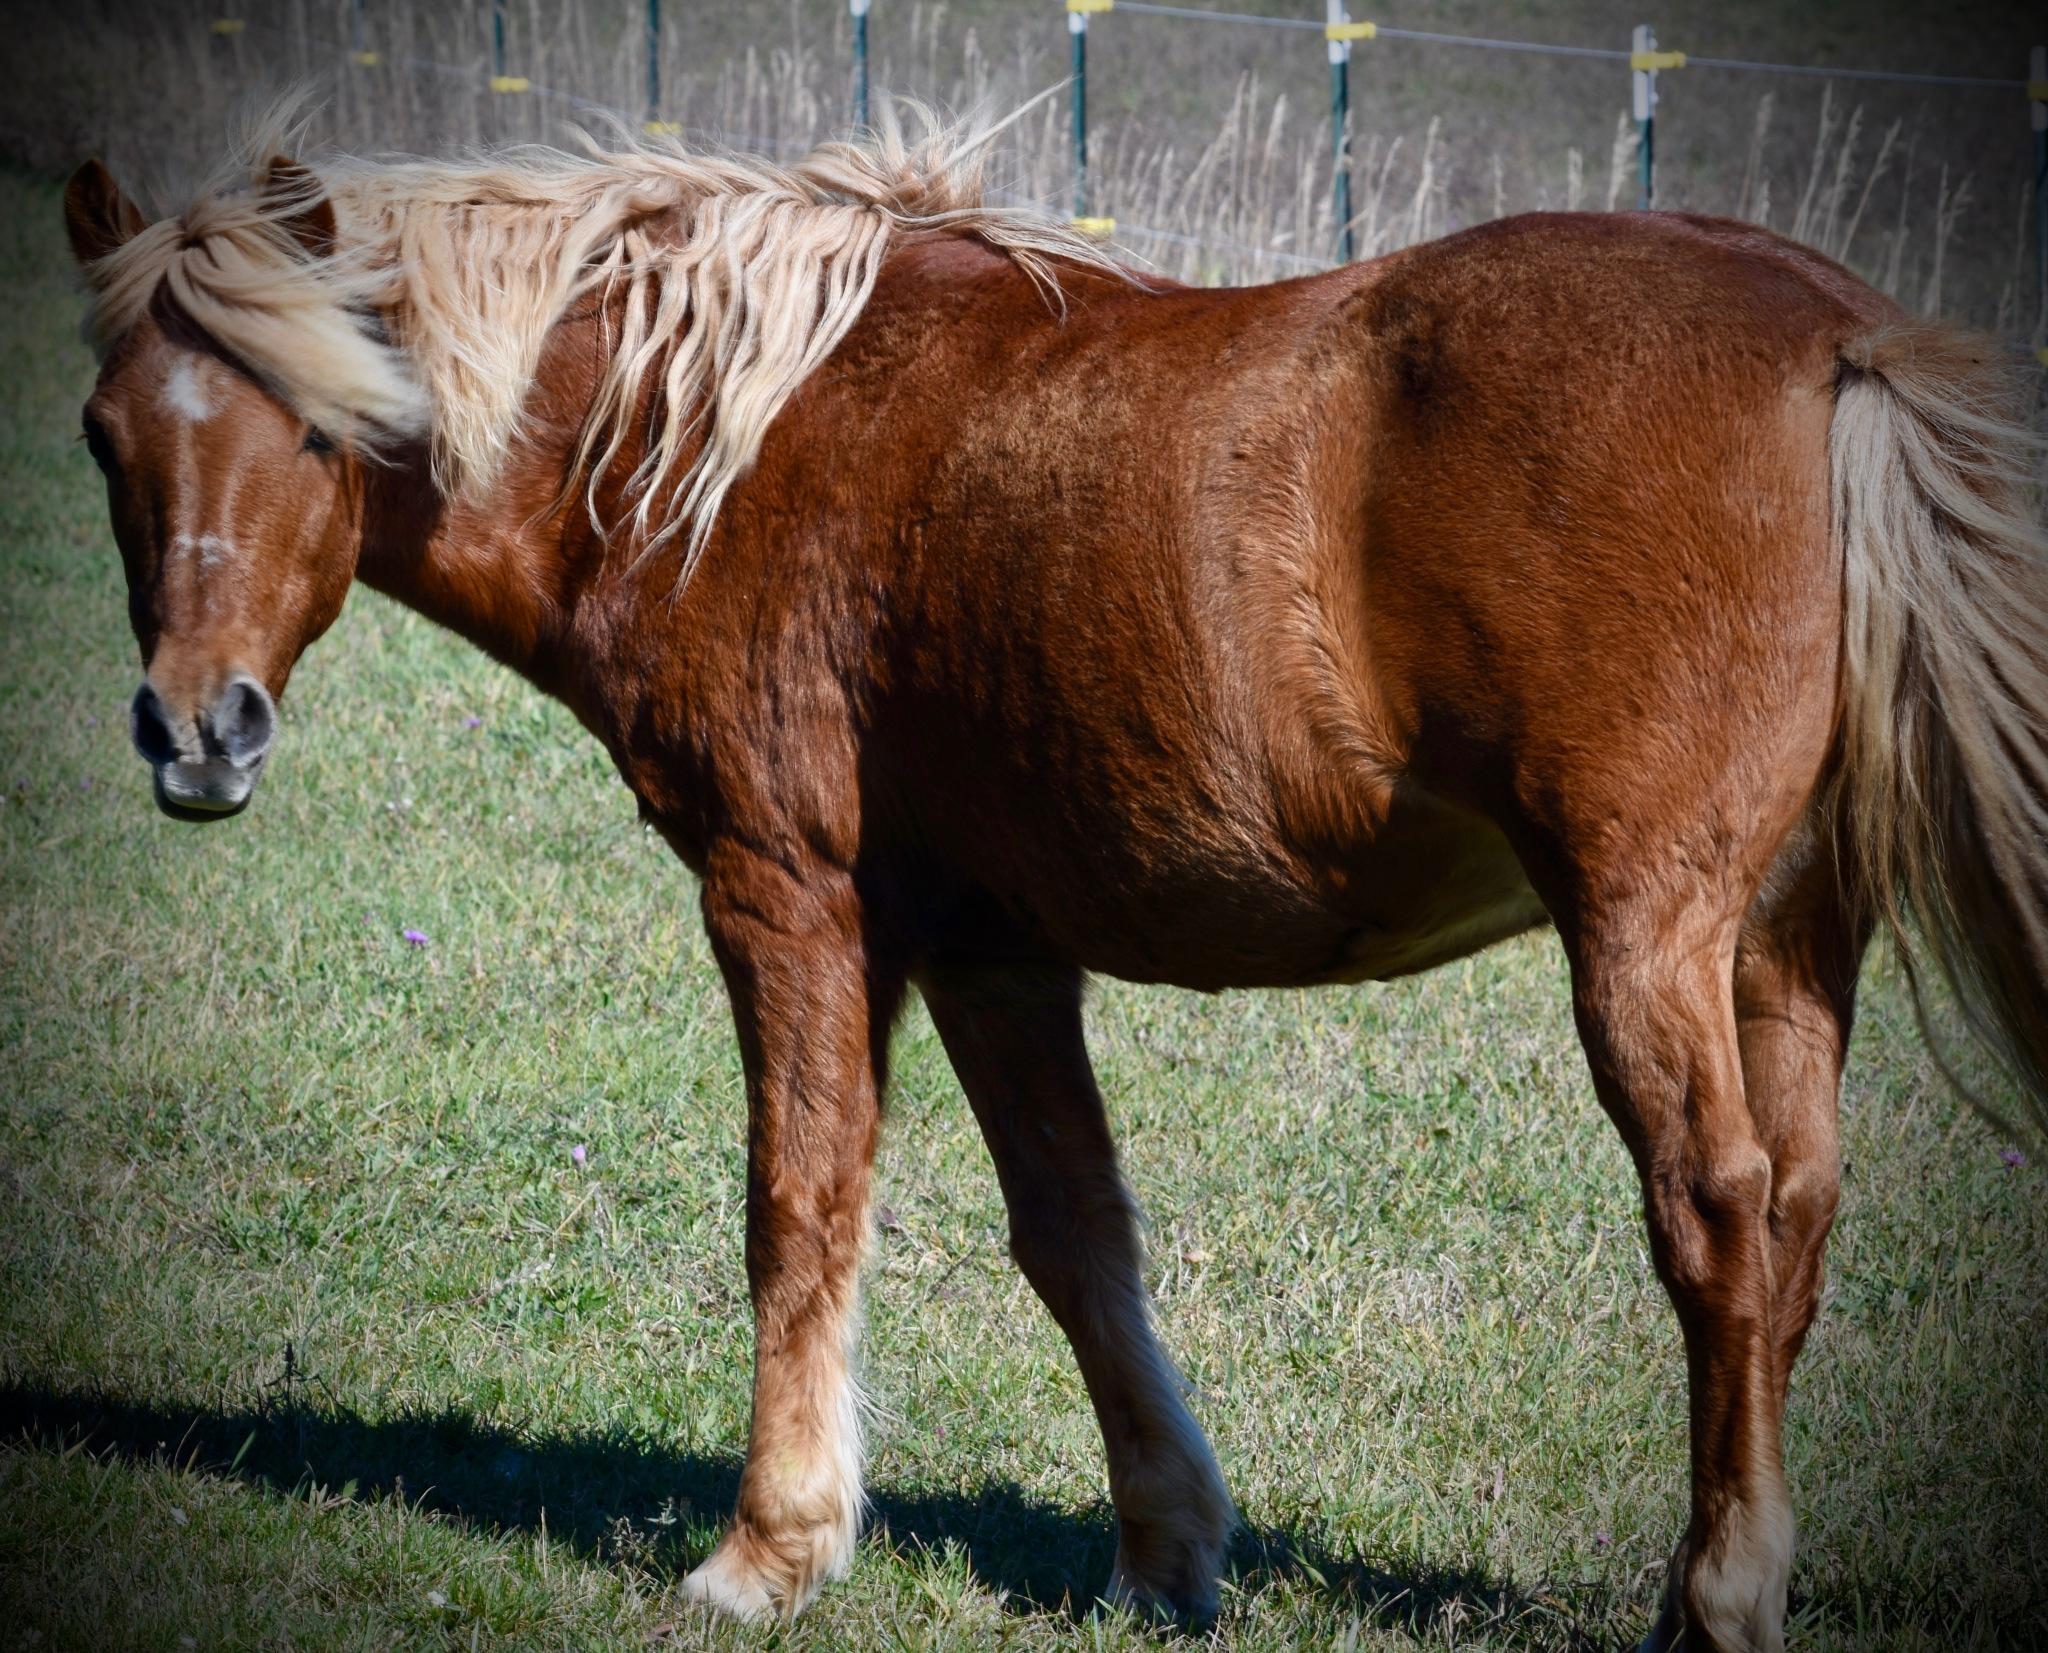 Horse in the Vineyard by John  Lepisto